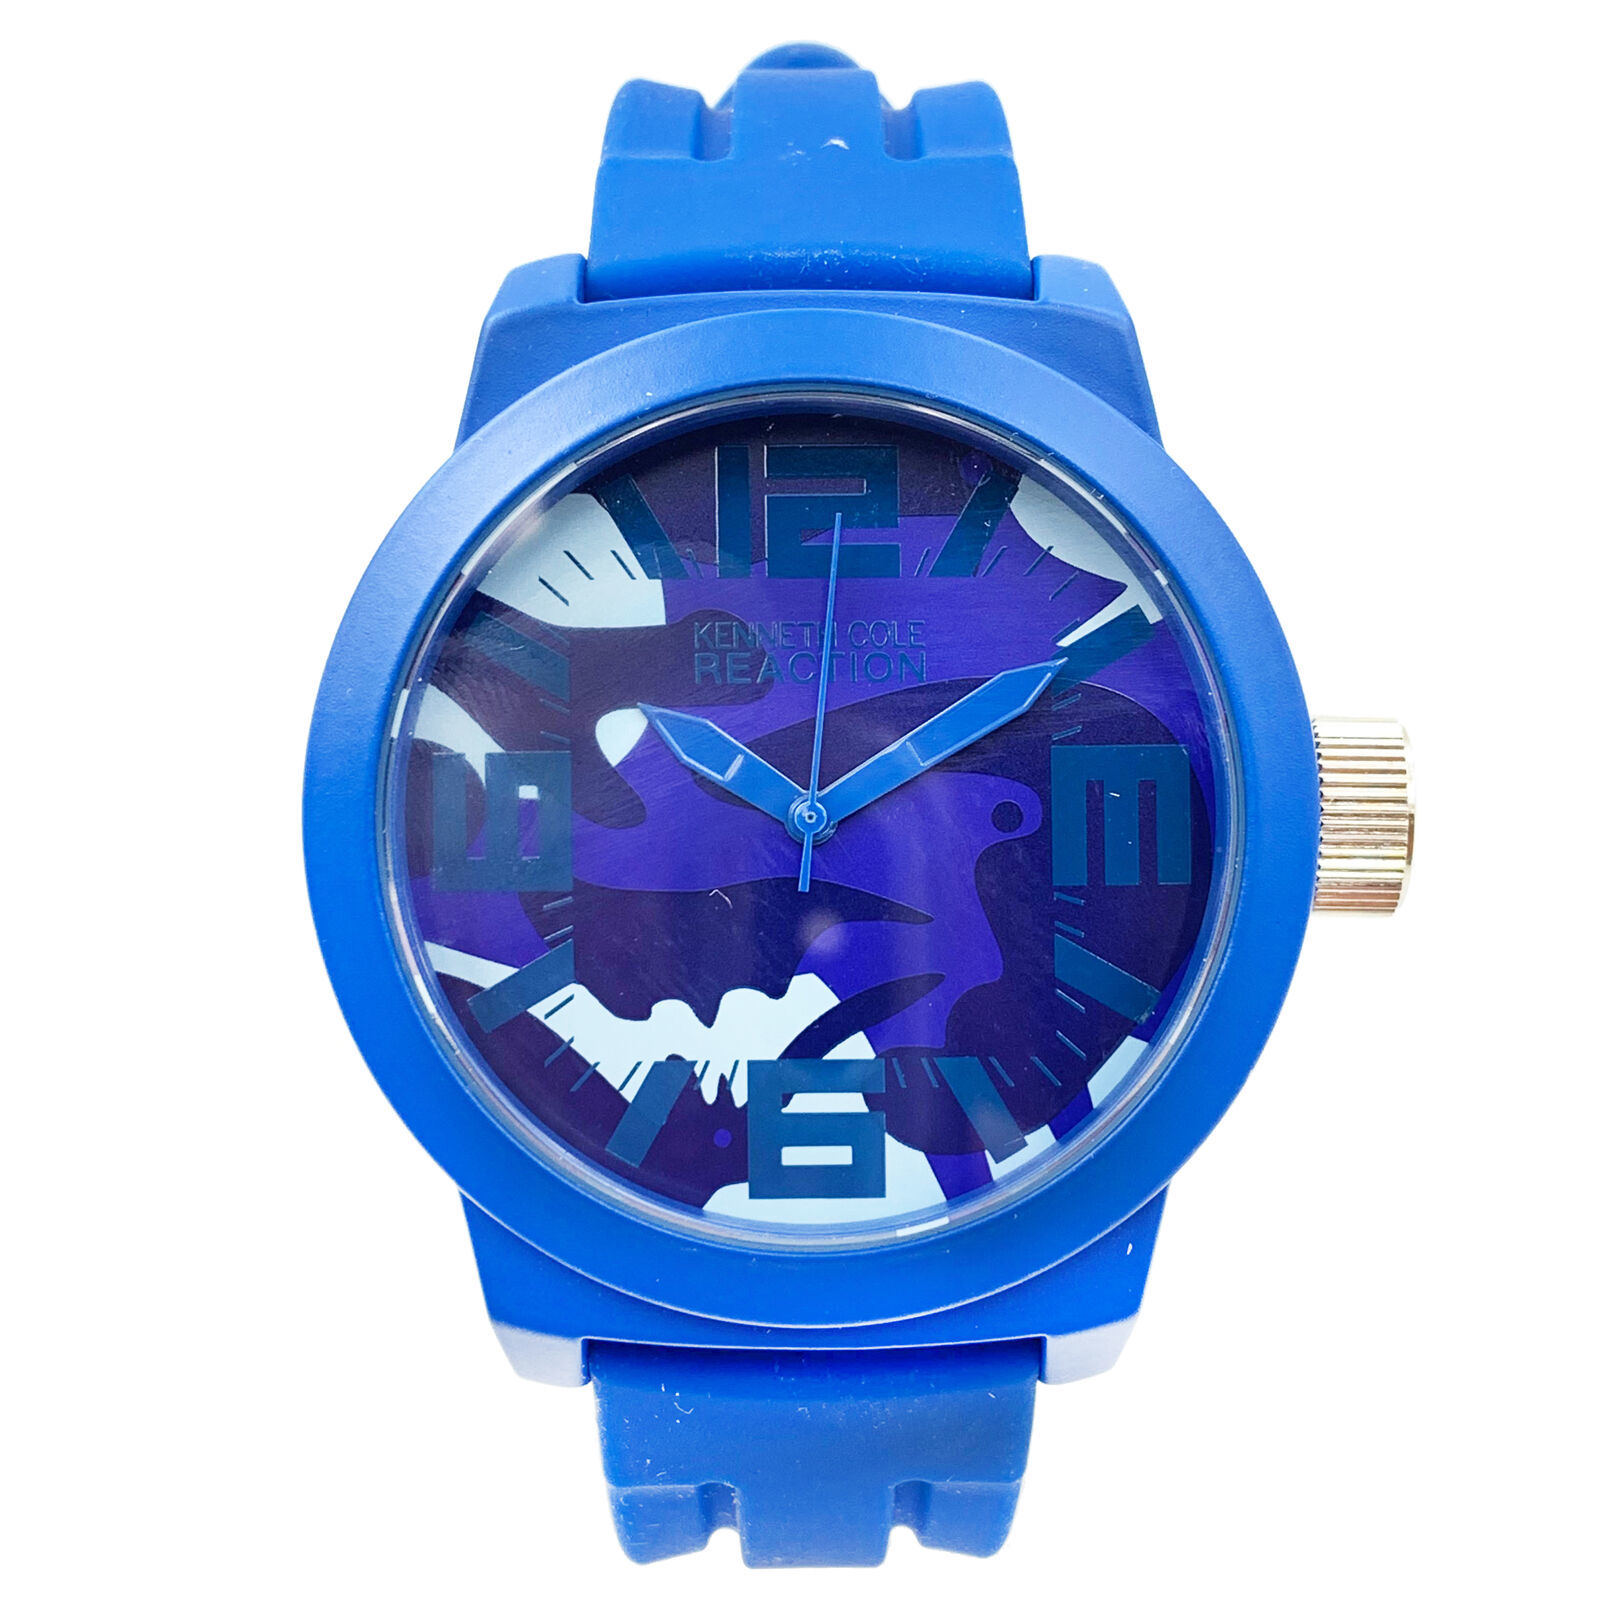 Kenneth Cole Reaction Silicone Blue band Mens Quartz watch RK1296